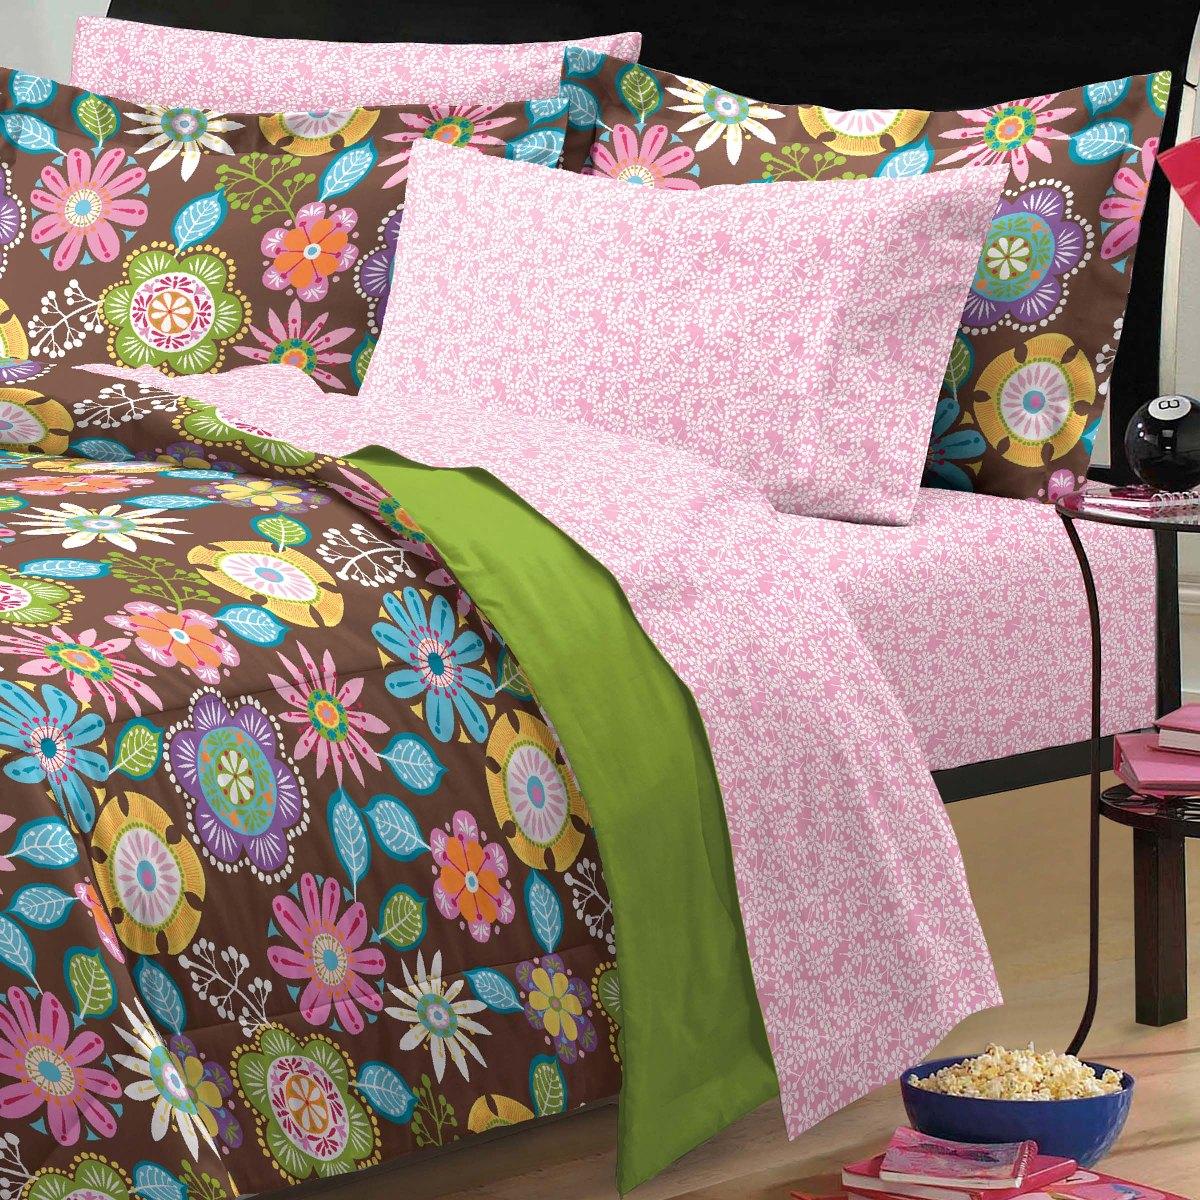 new boho garden teen girls bedding comforter sheet set twin twin xl ebay. Black Bedroom Furniture Sets. Home Design Ideas